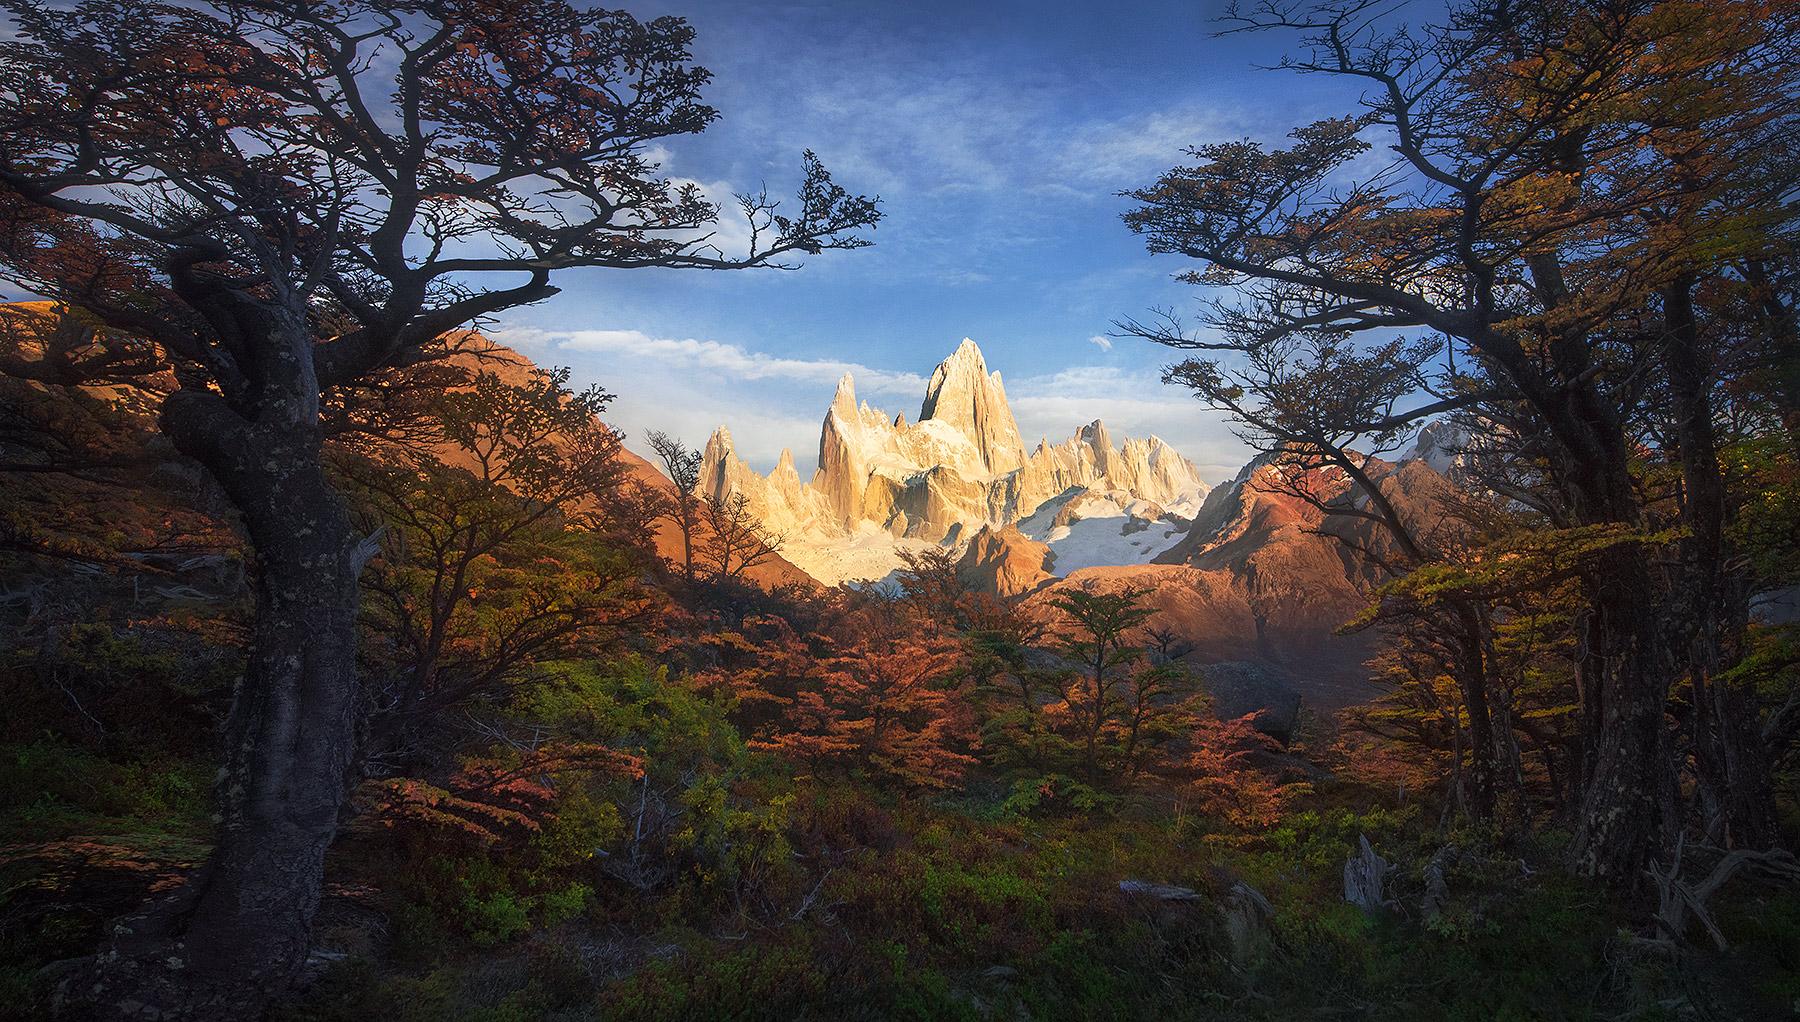 Fitz Roy,  Argentina, Lena, autumn, forest, photo